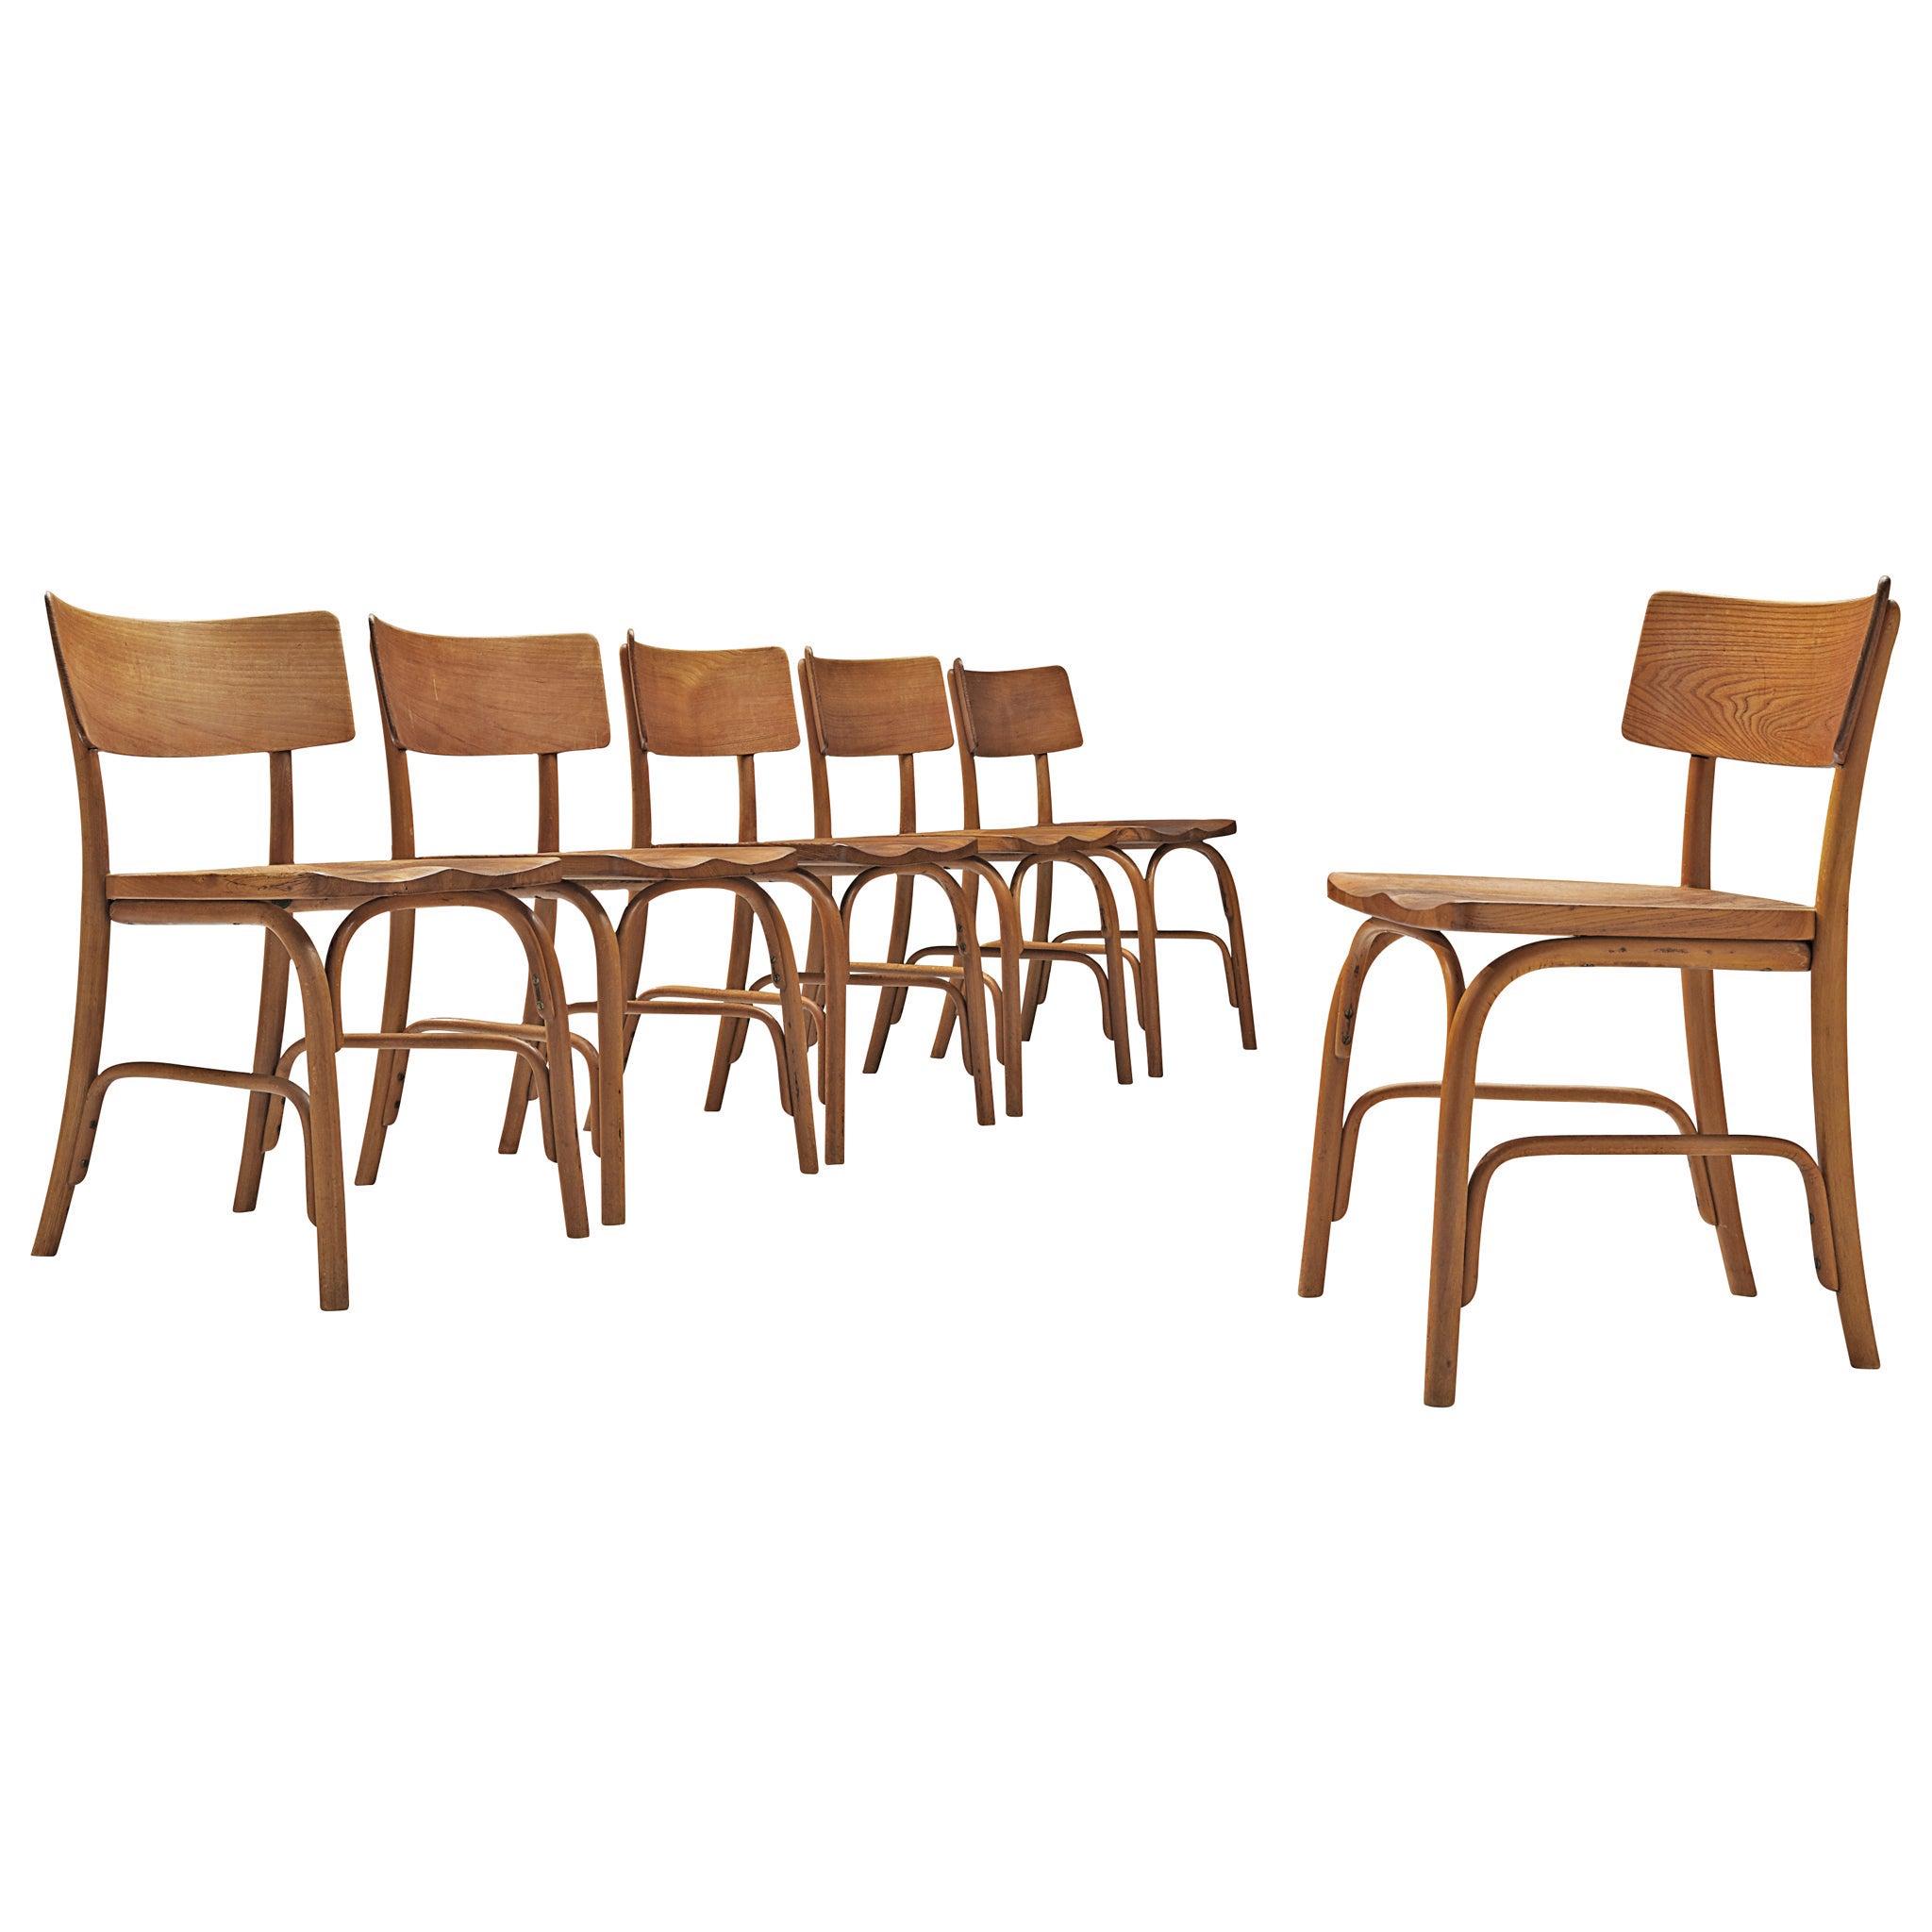 Frits Schlegel for Fritz Hansen Set of Six 'Husum' Chairs